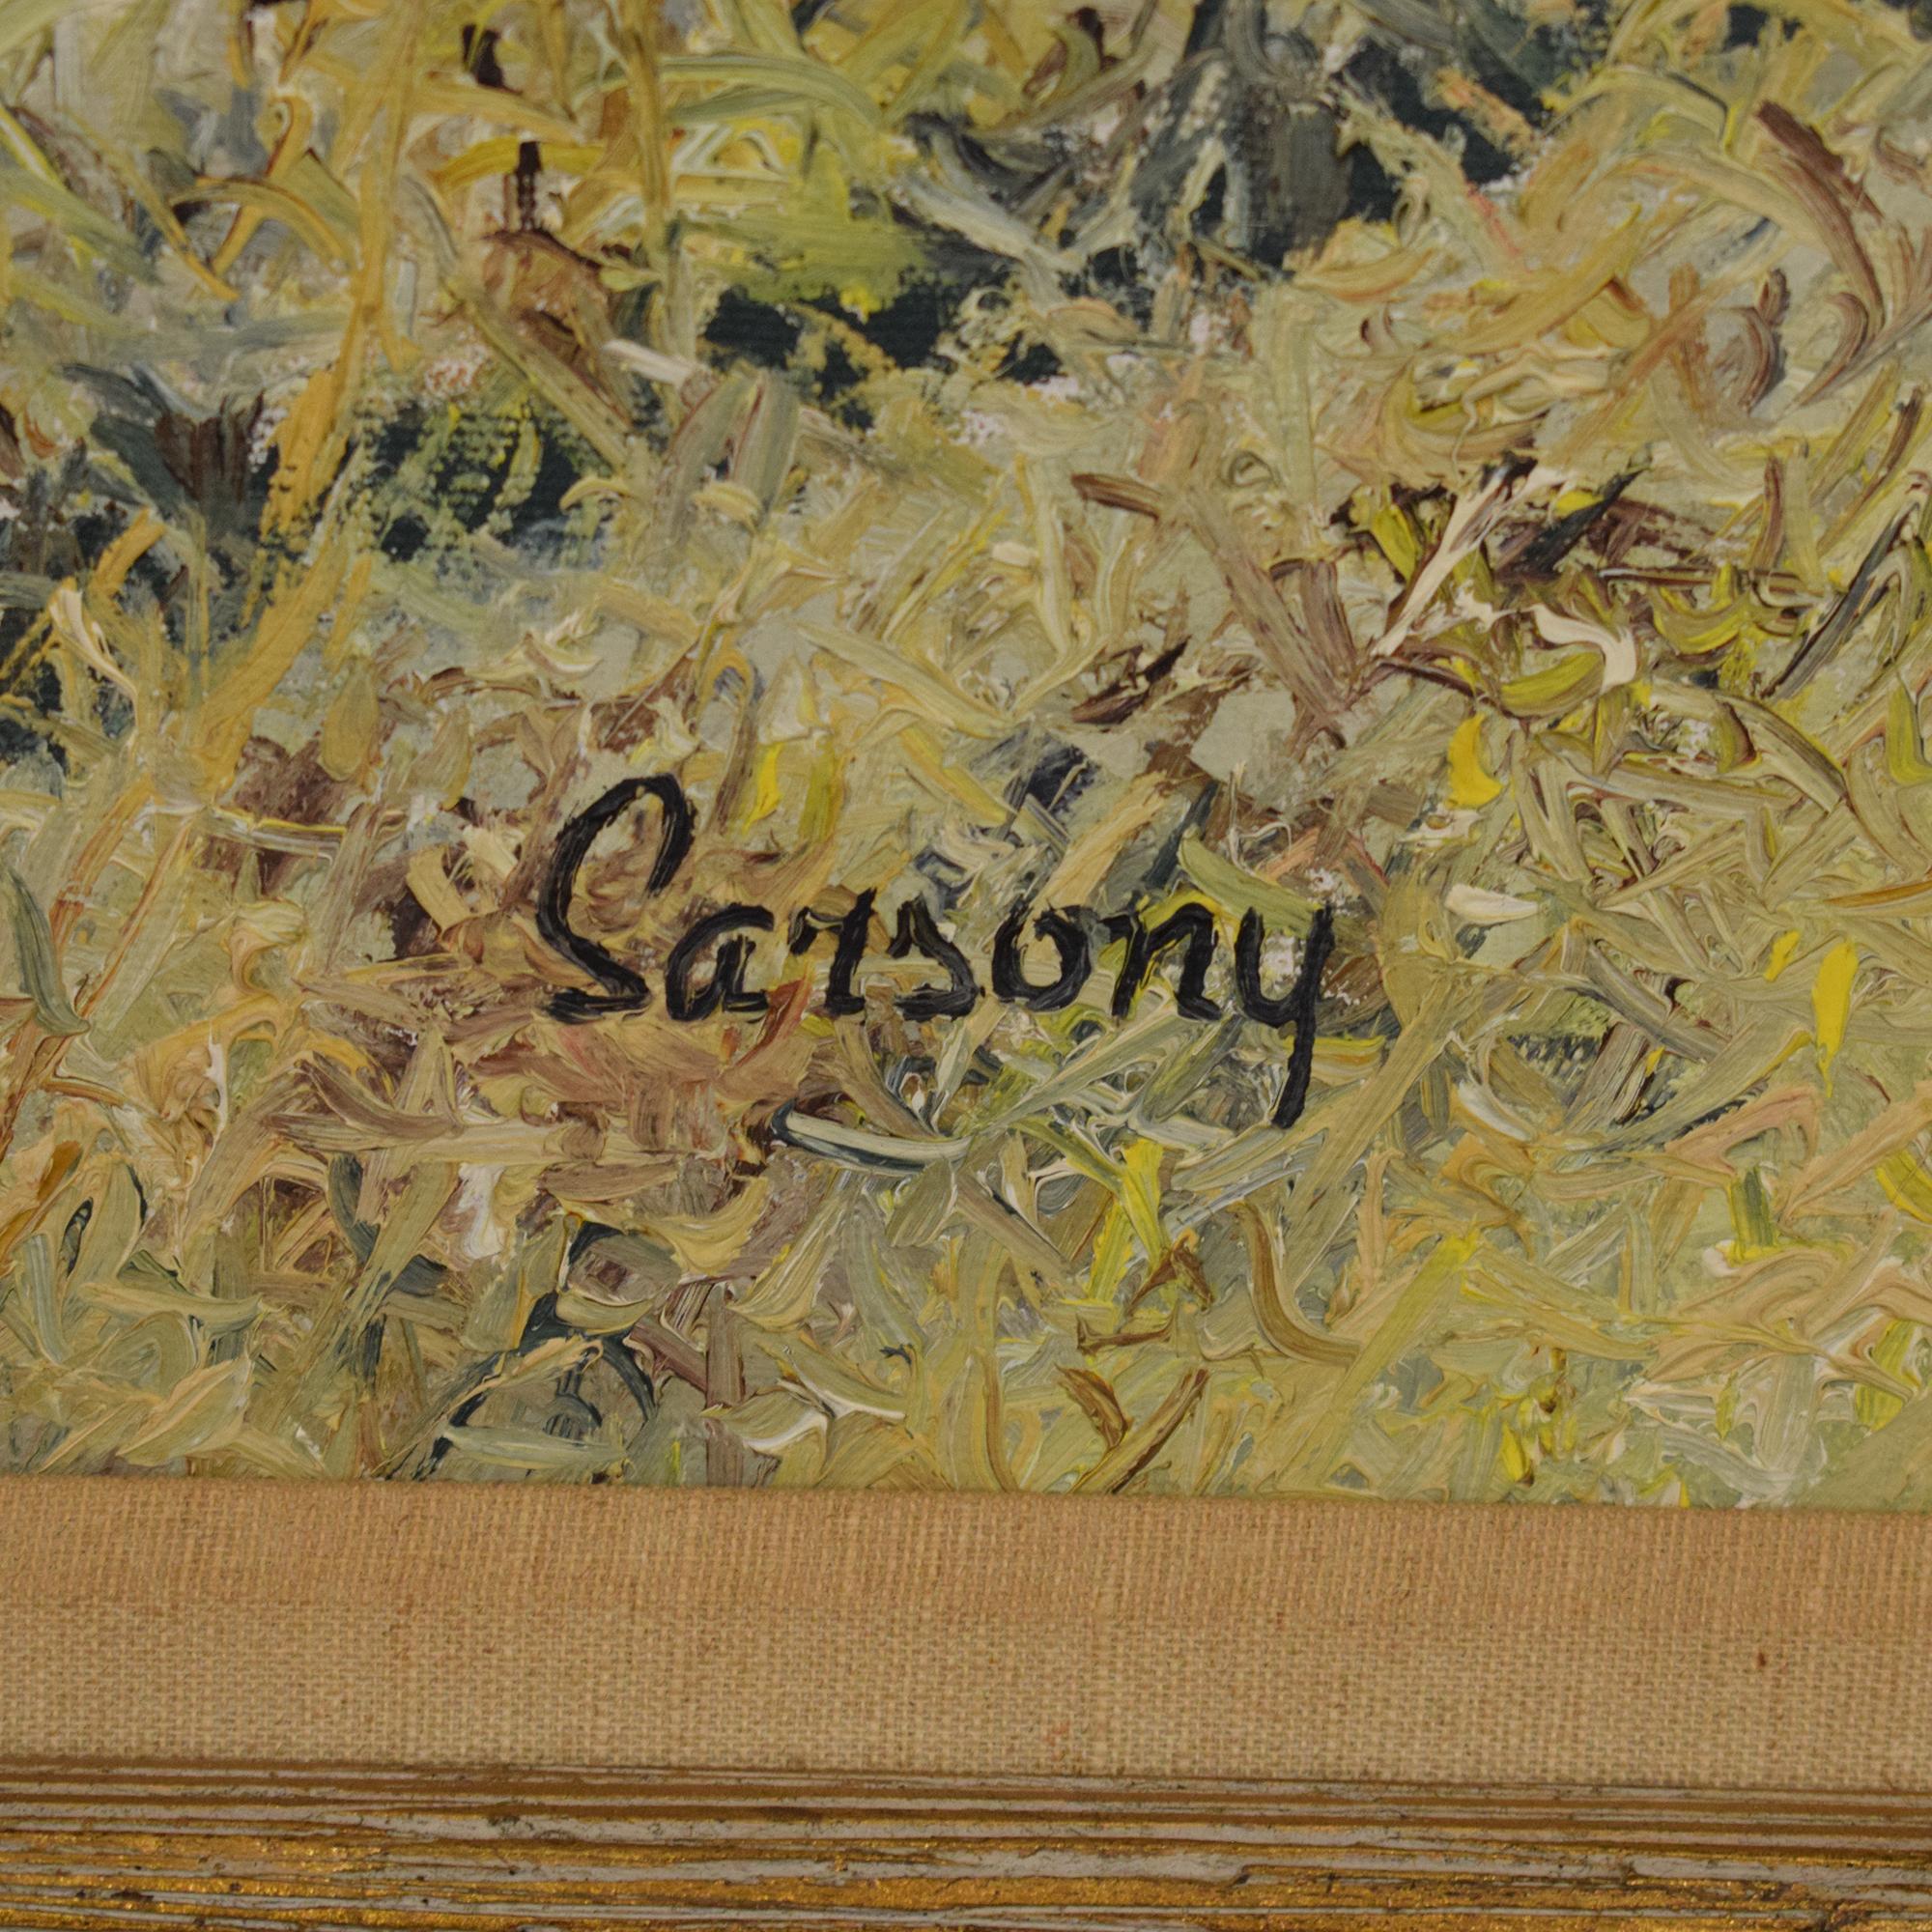 Robert Sarsony Wheel at the Barn Corner Framed Wall Art dimensions